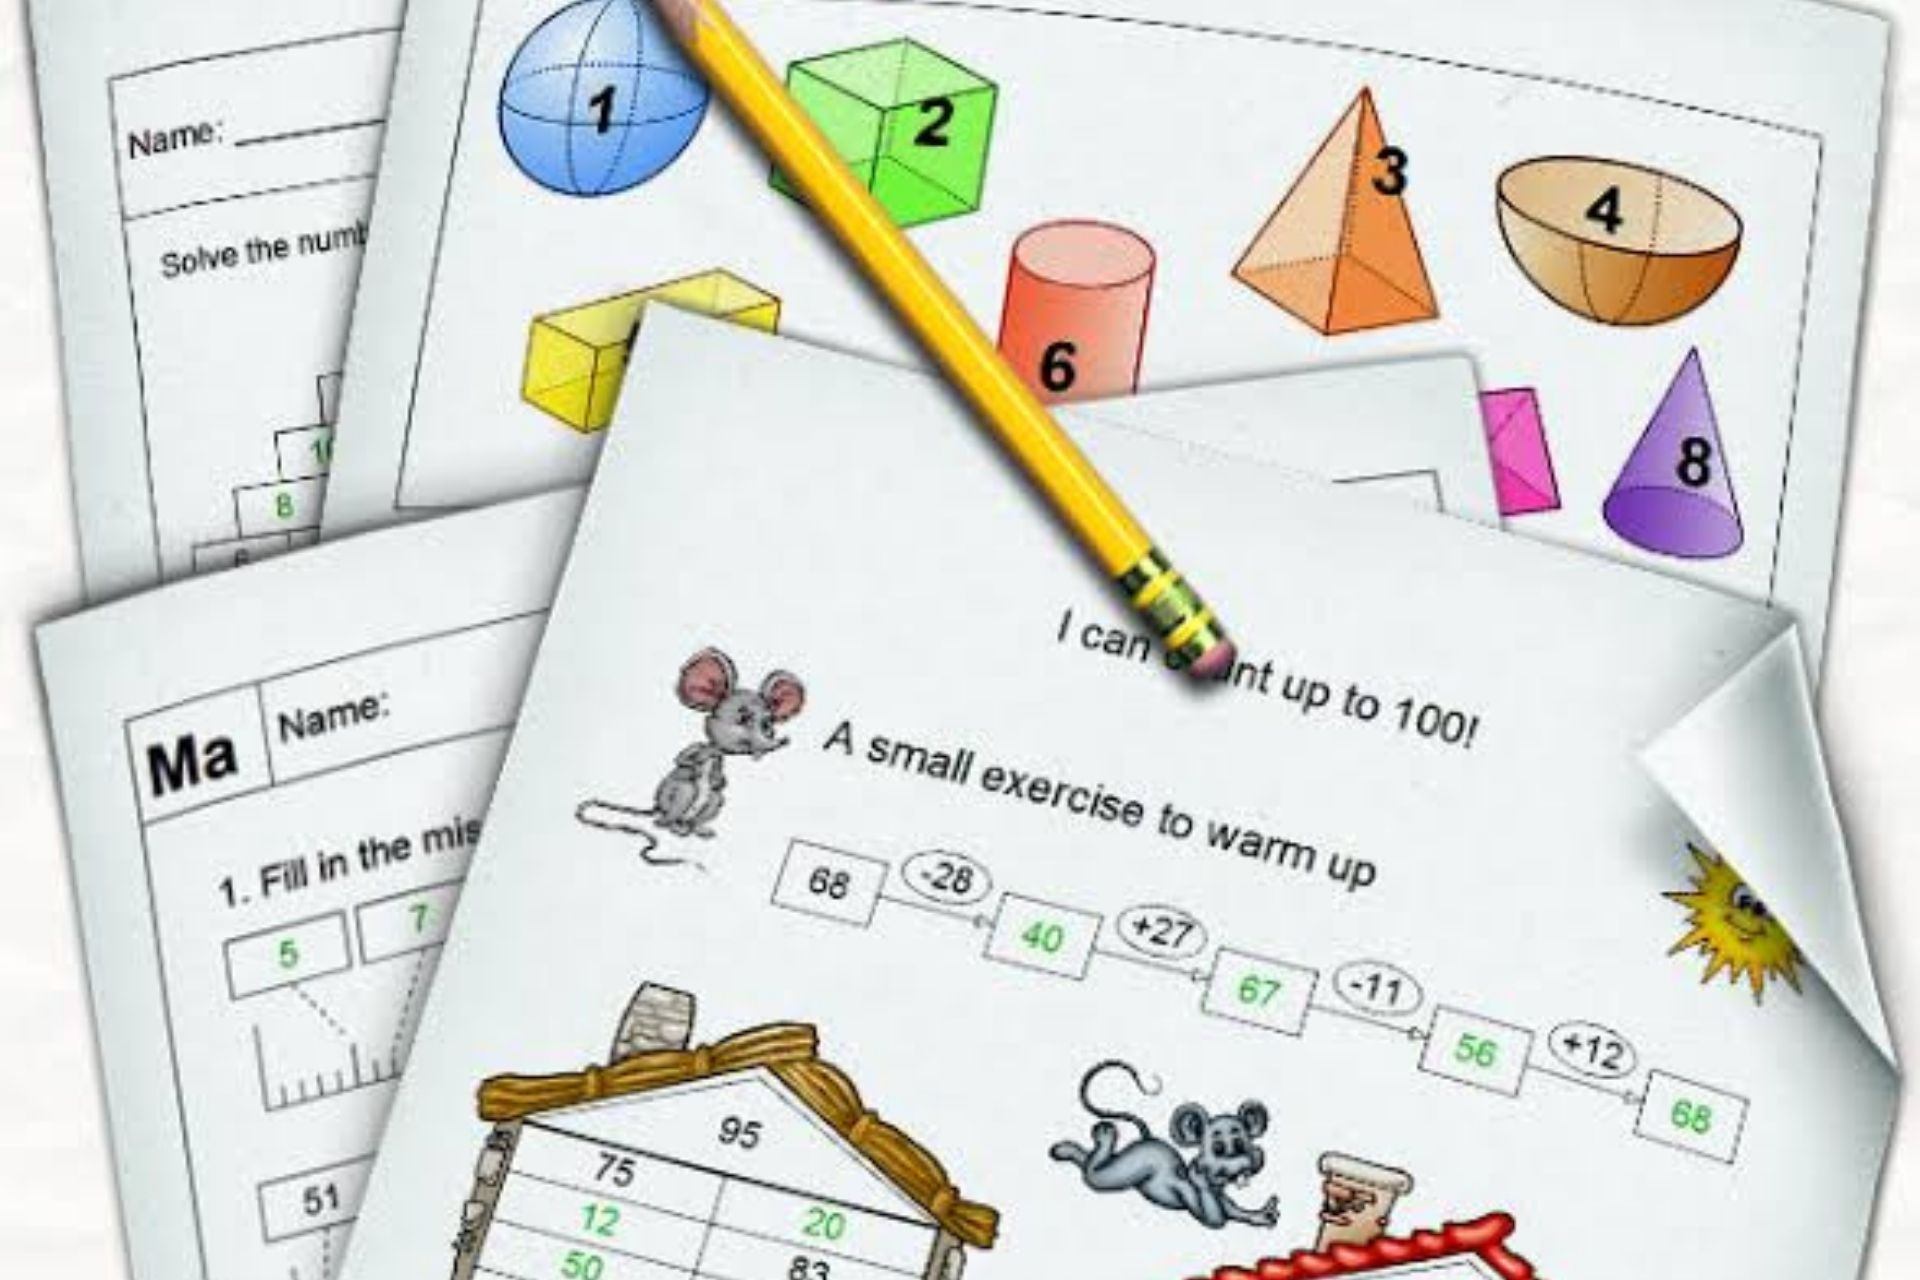 worksheet for toddlers, worksheet for preschoolers, worksheet for kindergarteners